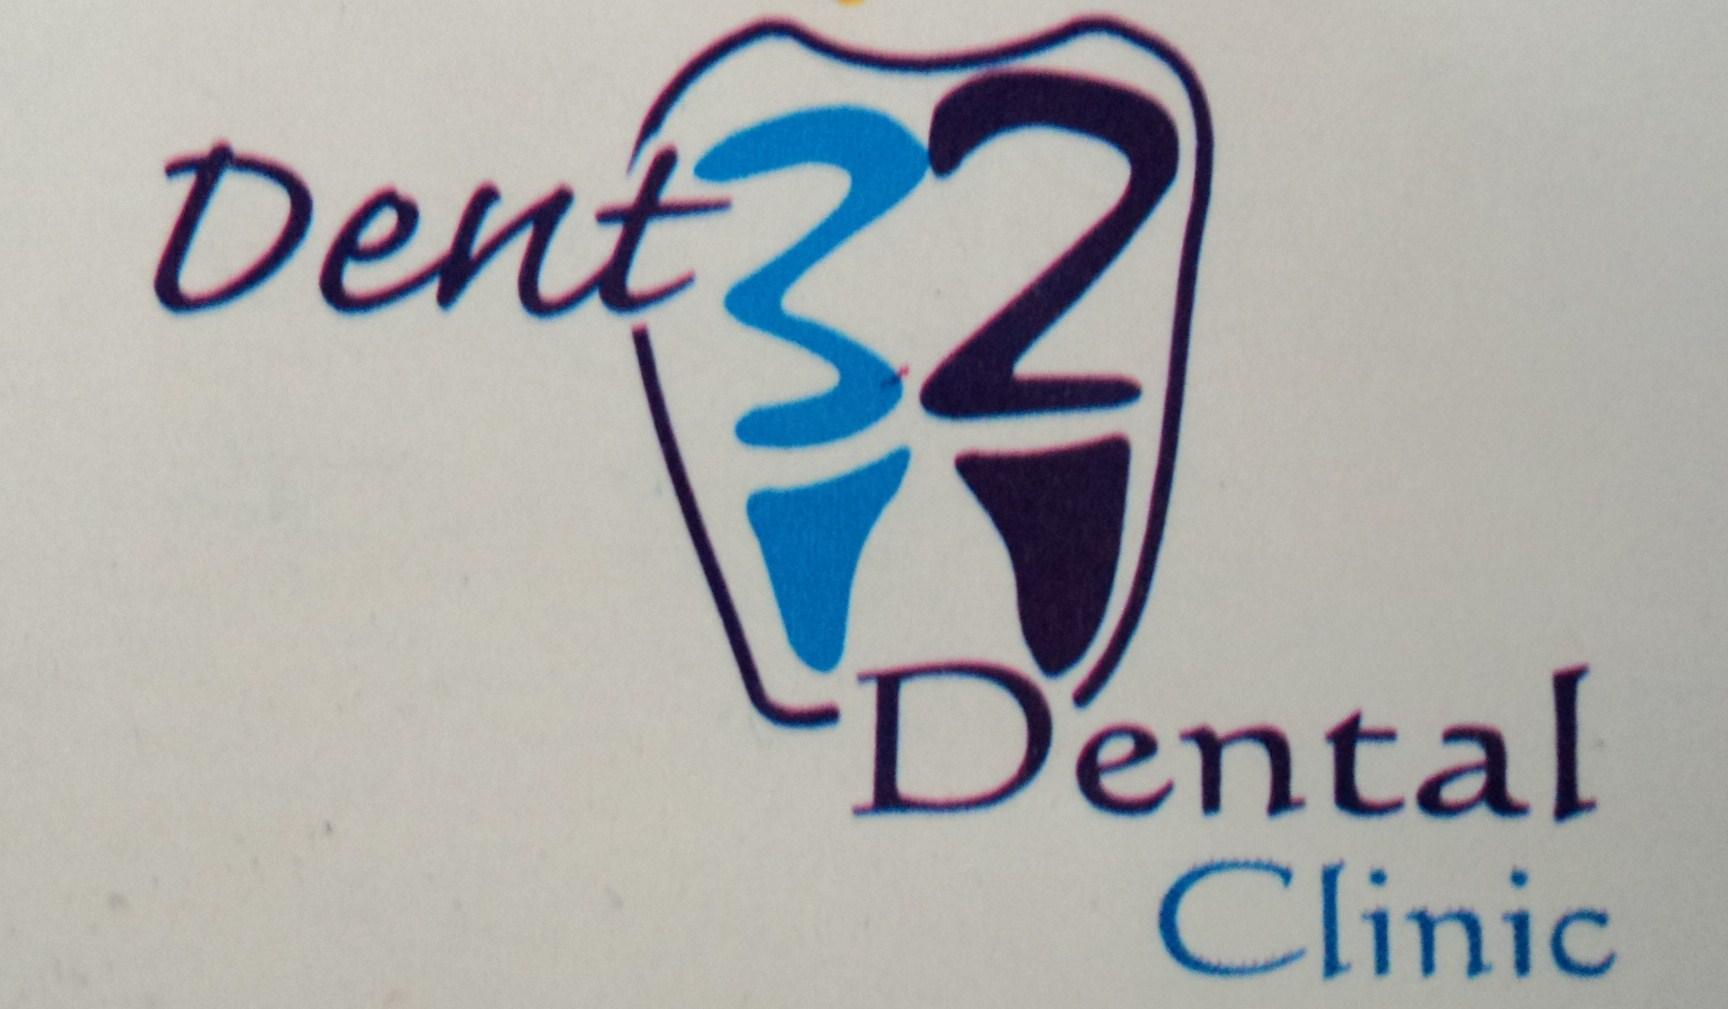 Dent 32 Dental Clinic